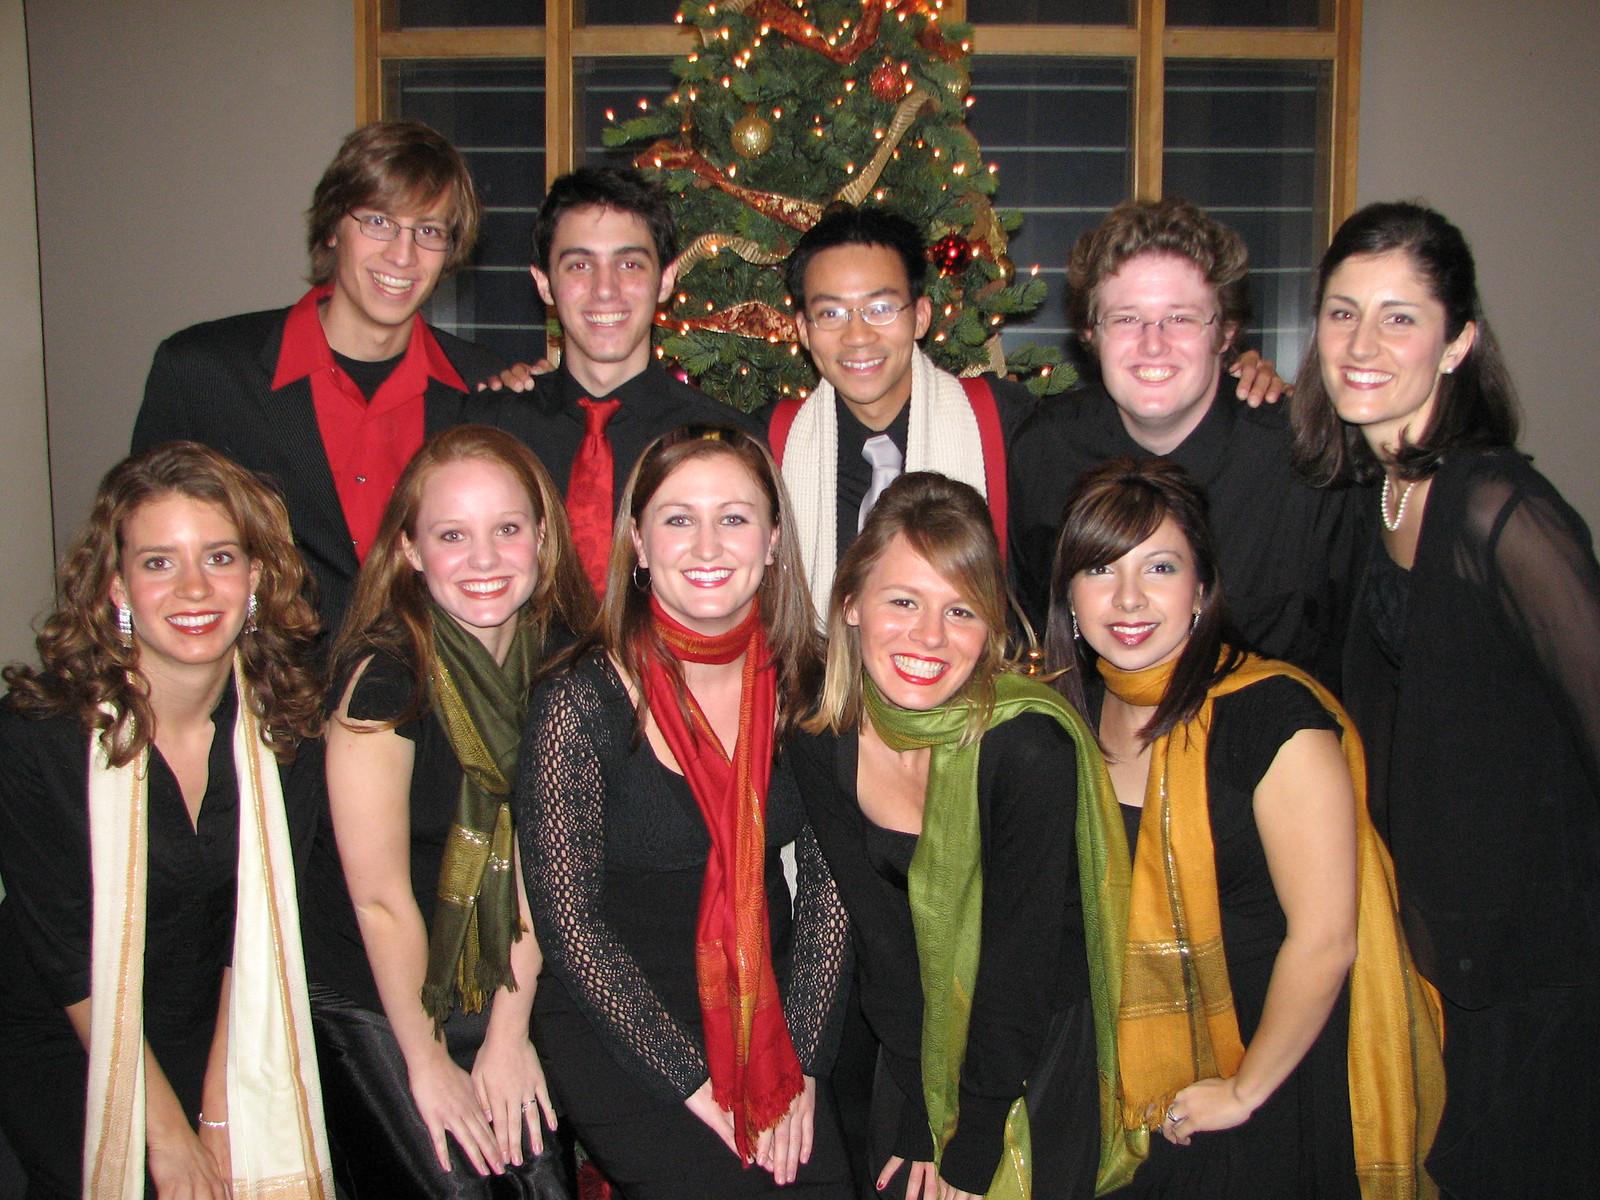 2006 12 09 Sat - Biola Vocal Jazz Ensemble 1 - Dan Rigall, Trevor Gomes, Ben Yu, Jordan Johnson, Shawna Stewart, Laura Coghlan, Heather Onken, Heidi Bargen, Charissa Noble, & Jessi Vasquez